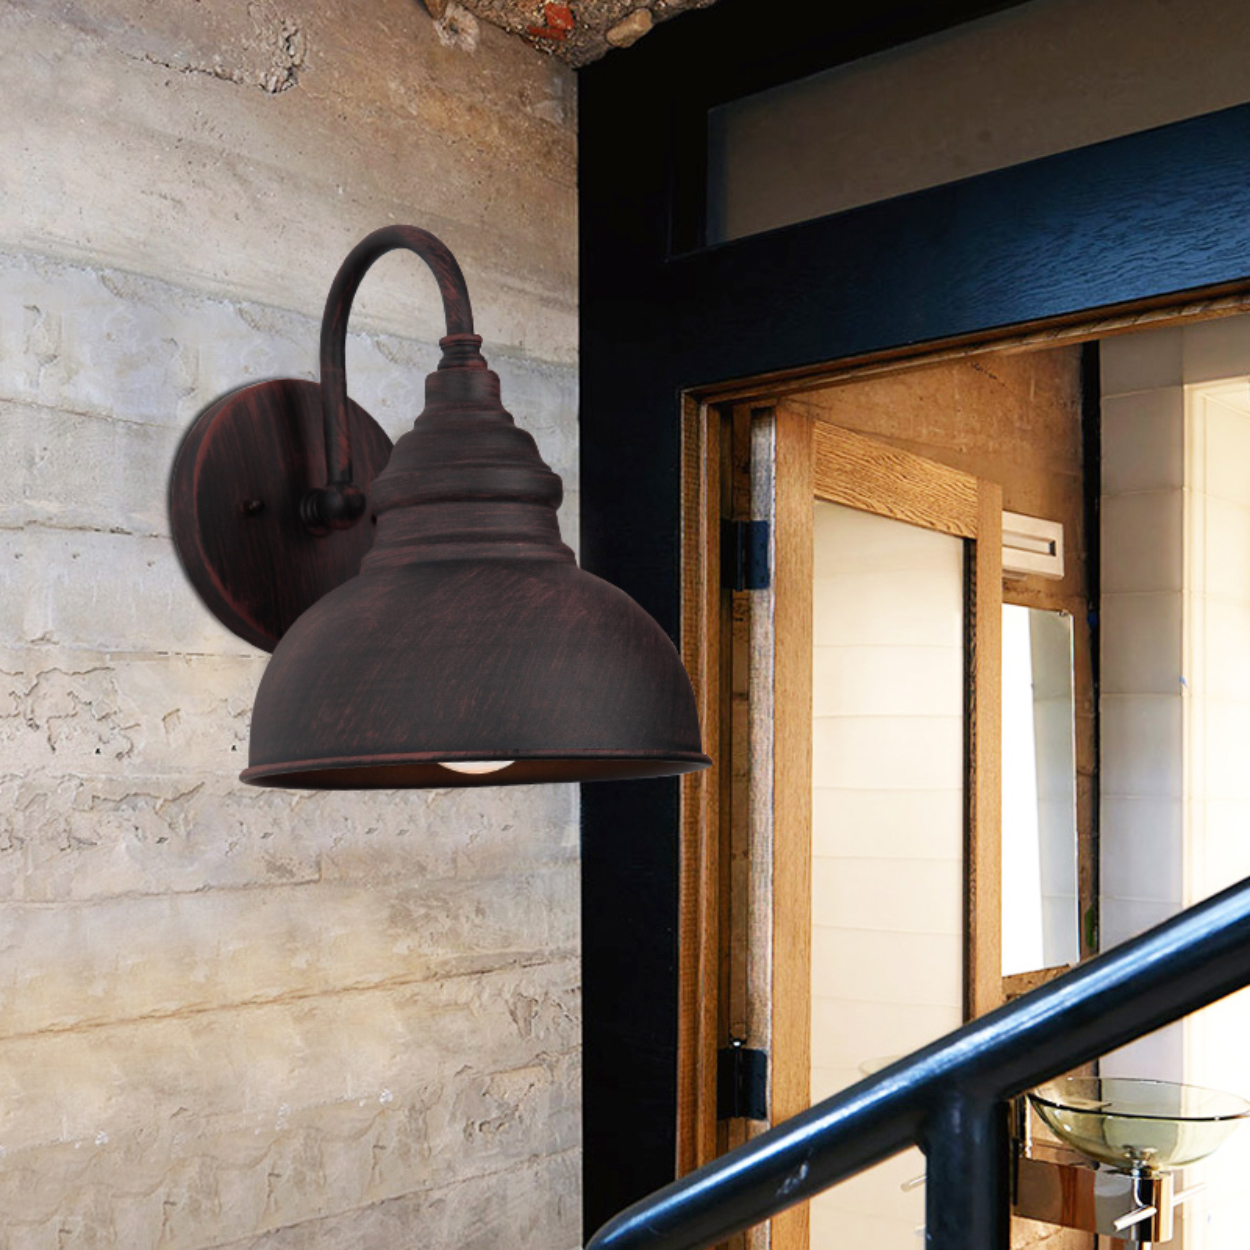 Retro Outdoor Wall Light Fixture  Villa Balcony  Lamp Waterproof Exterior Garden Doorway Light Vintage Entrance Porch Lamp